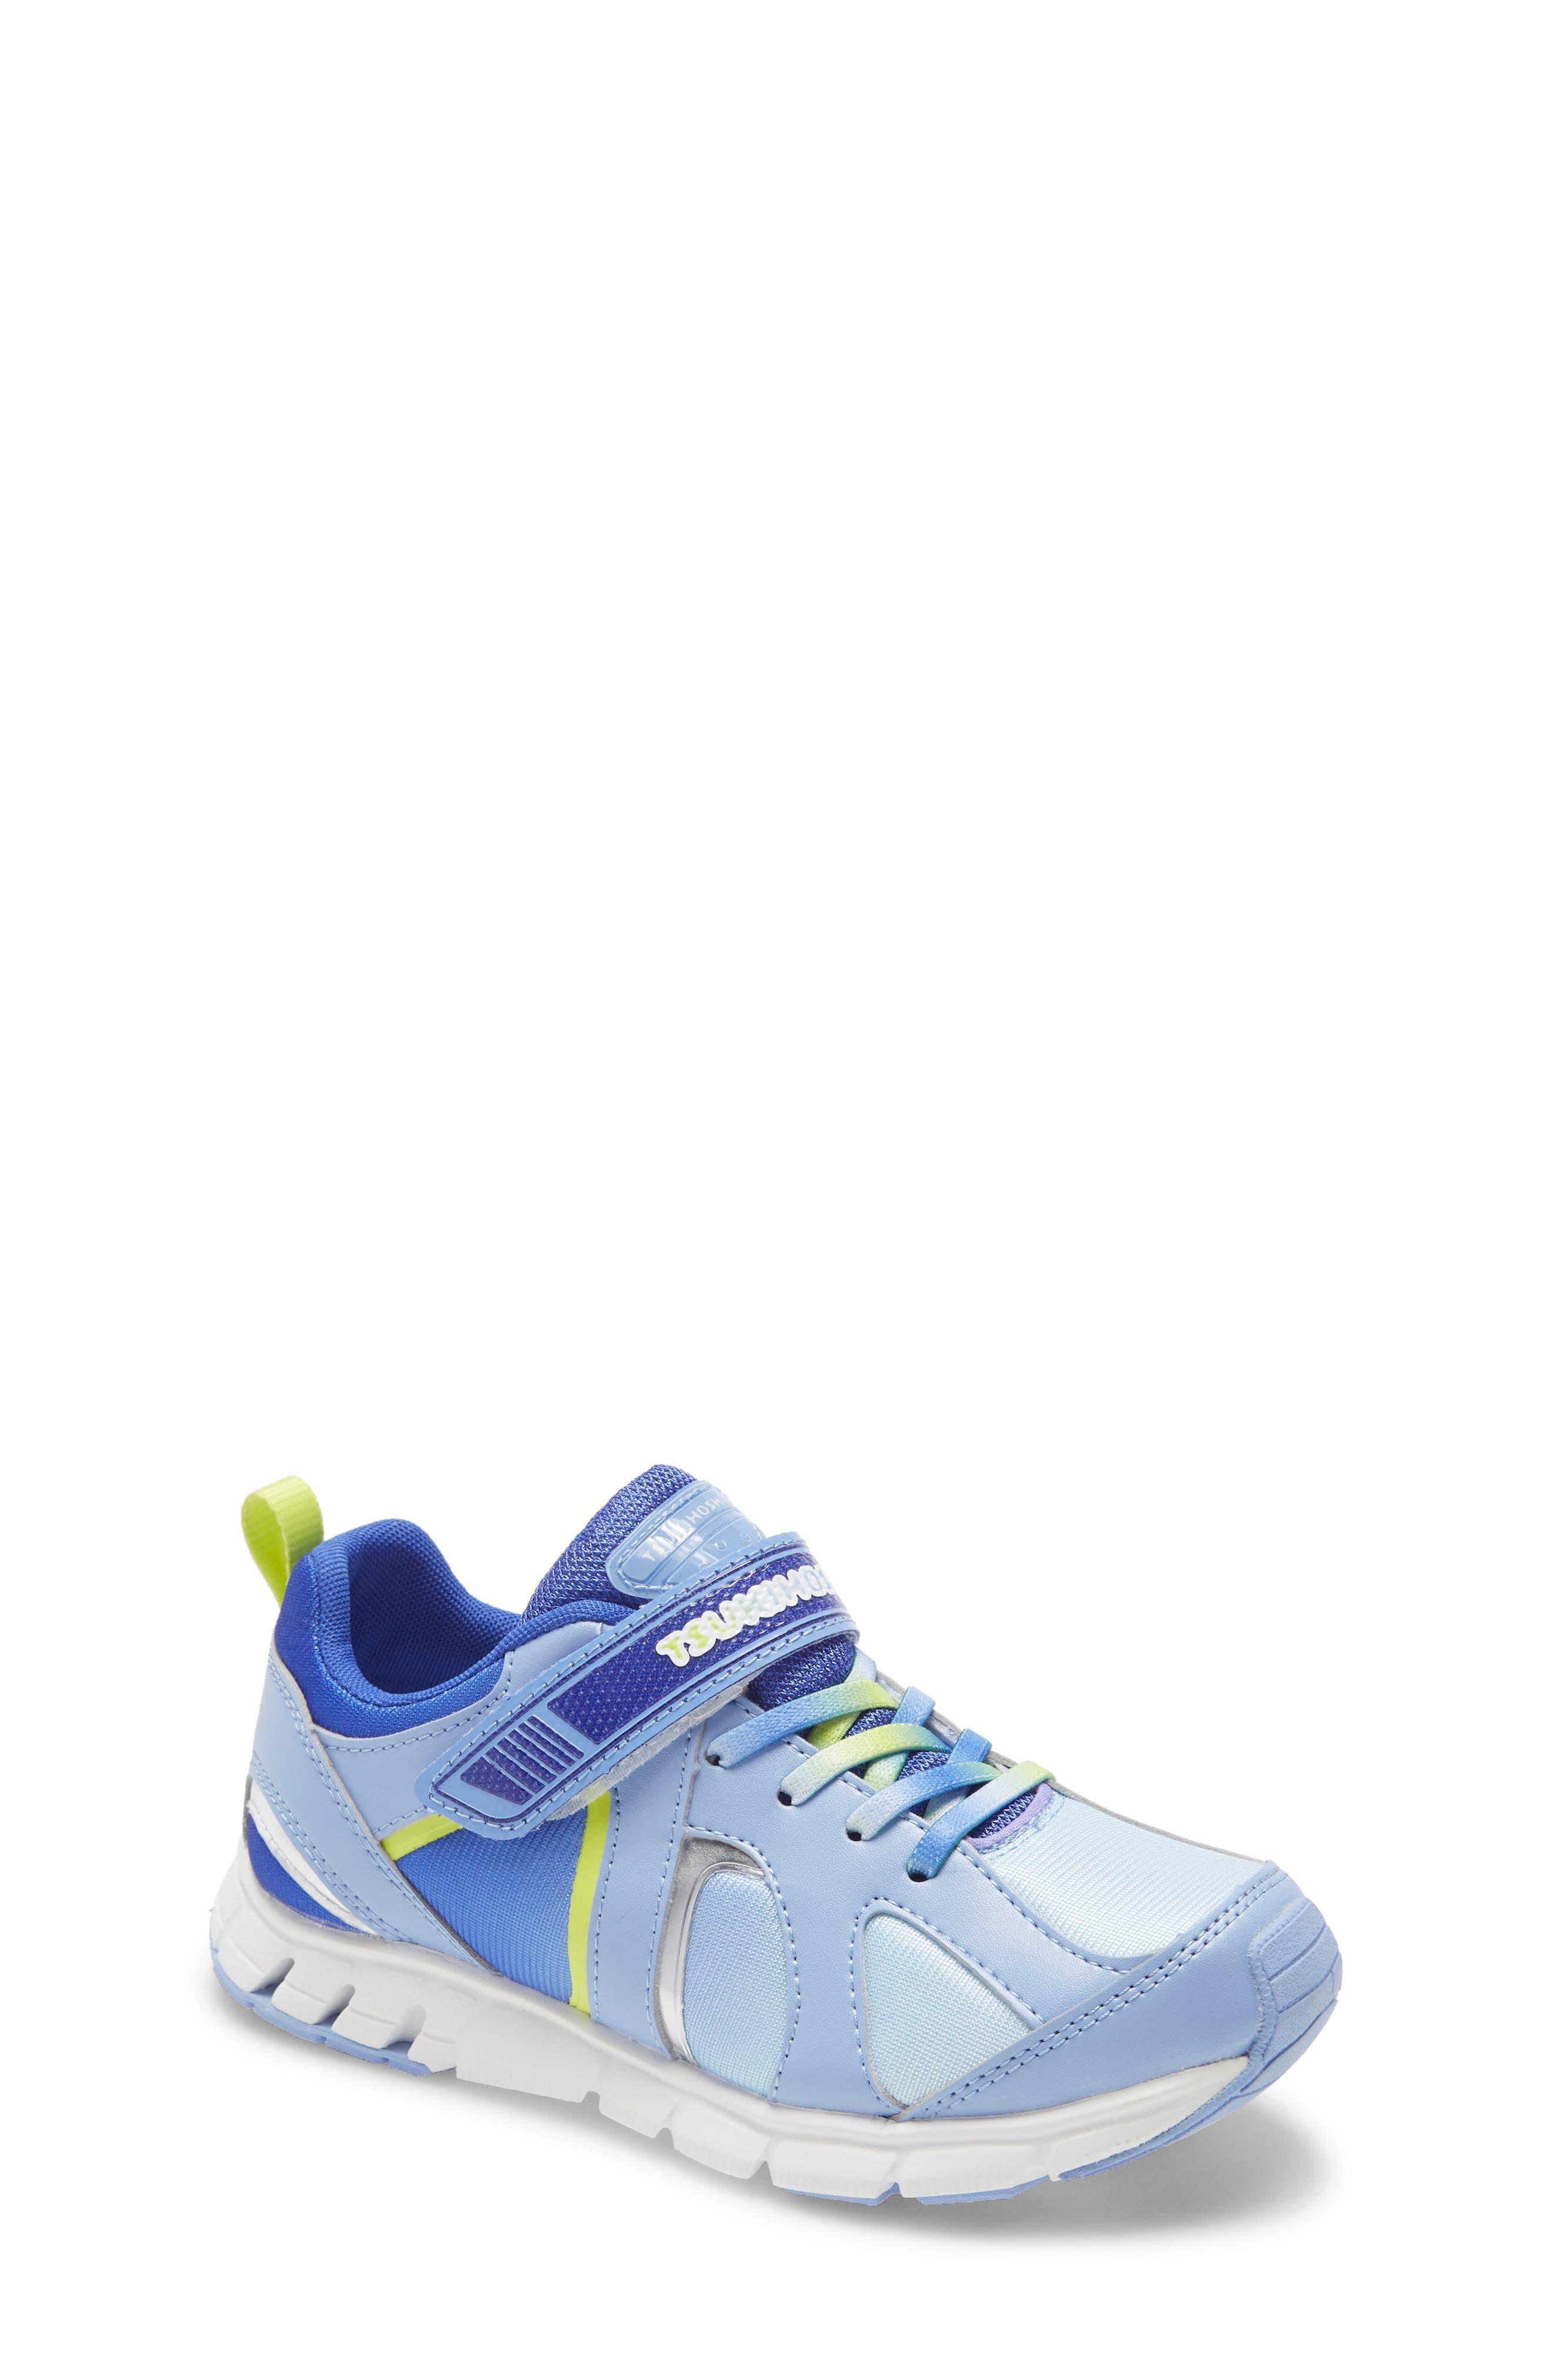 Tsukihoshi Rainbow Washable Sneaker